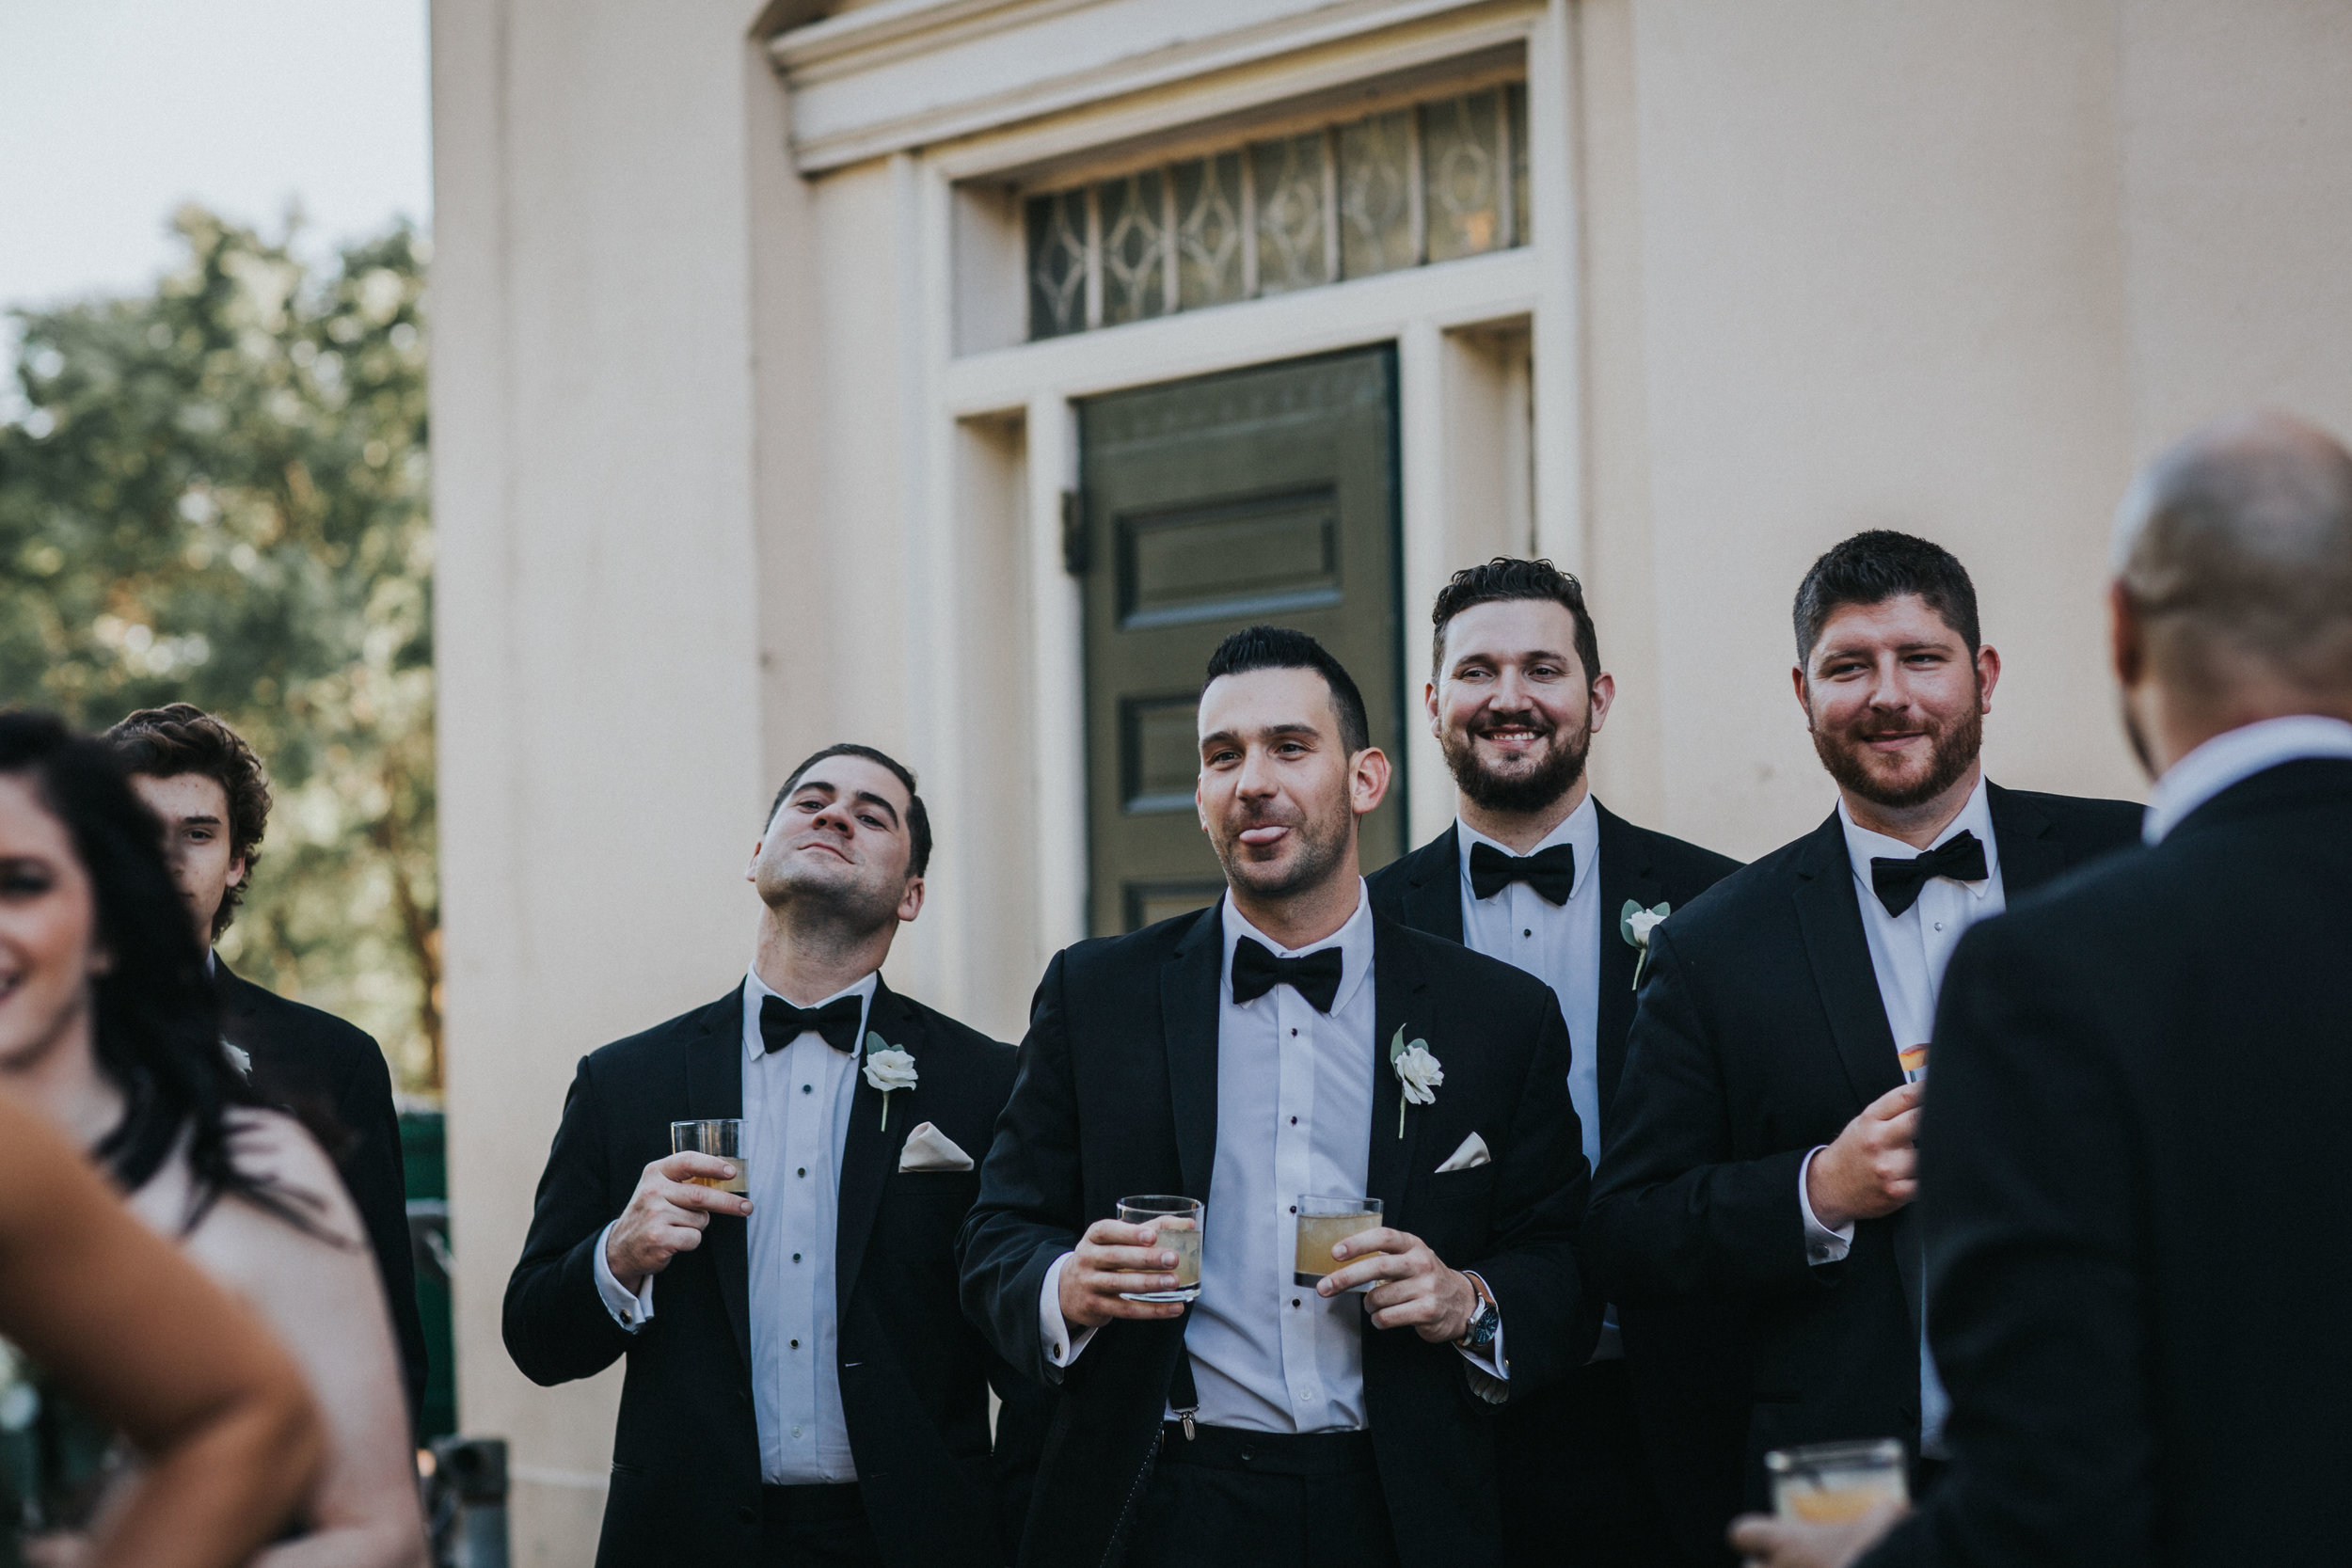 NewJersey_Wedding_Photography_Philadelphia__cescaphe_Waterworks_BridalParty-63.jpg